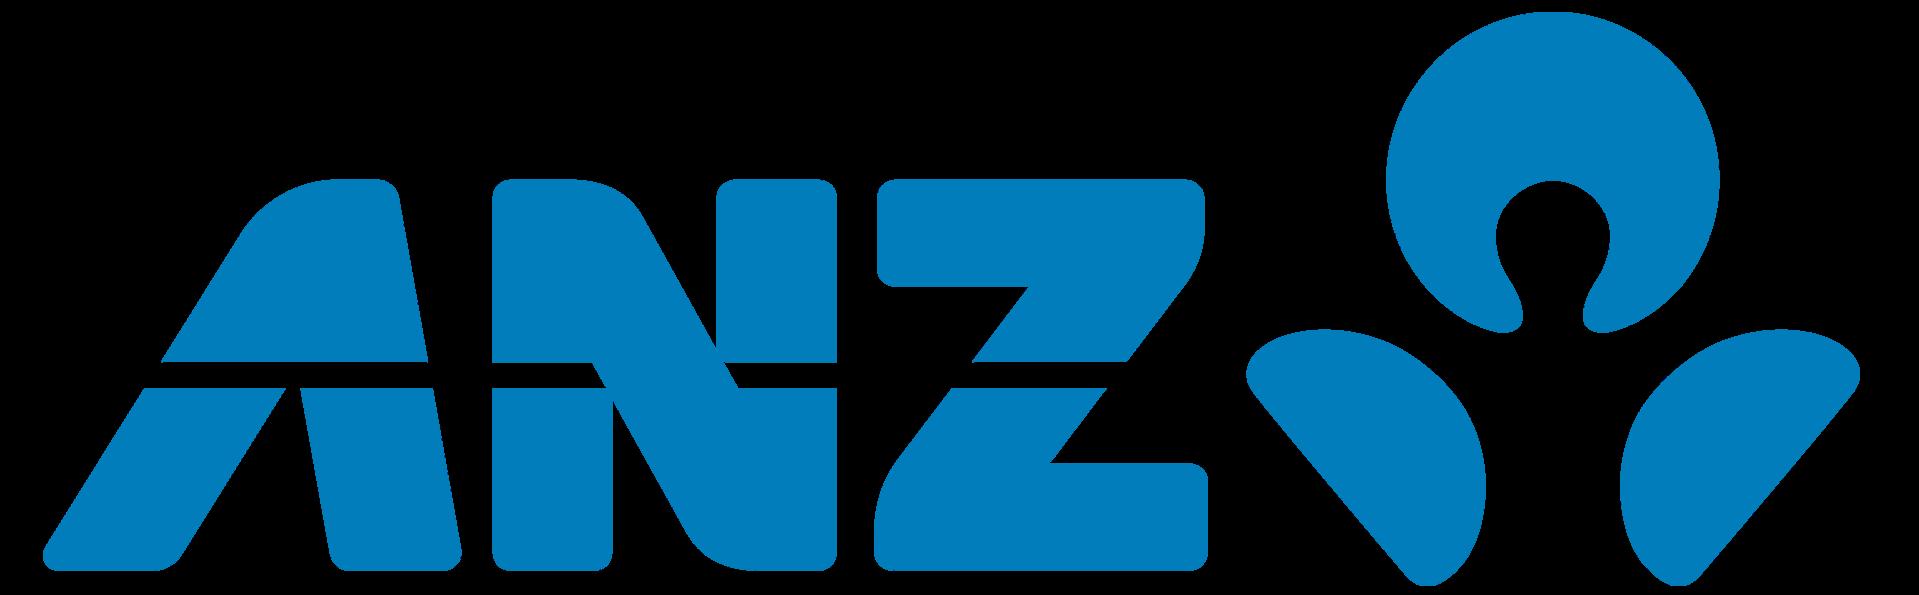 anz logo on deals mortgage website mortgage loan deals broker